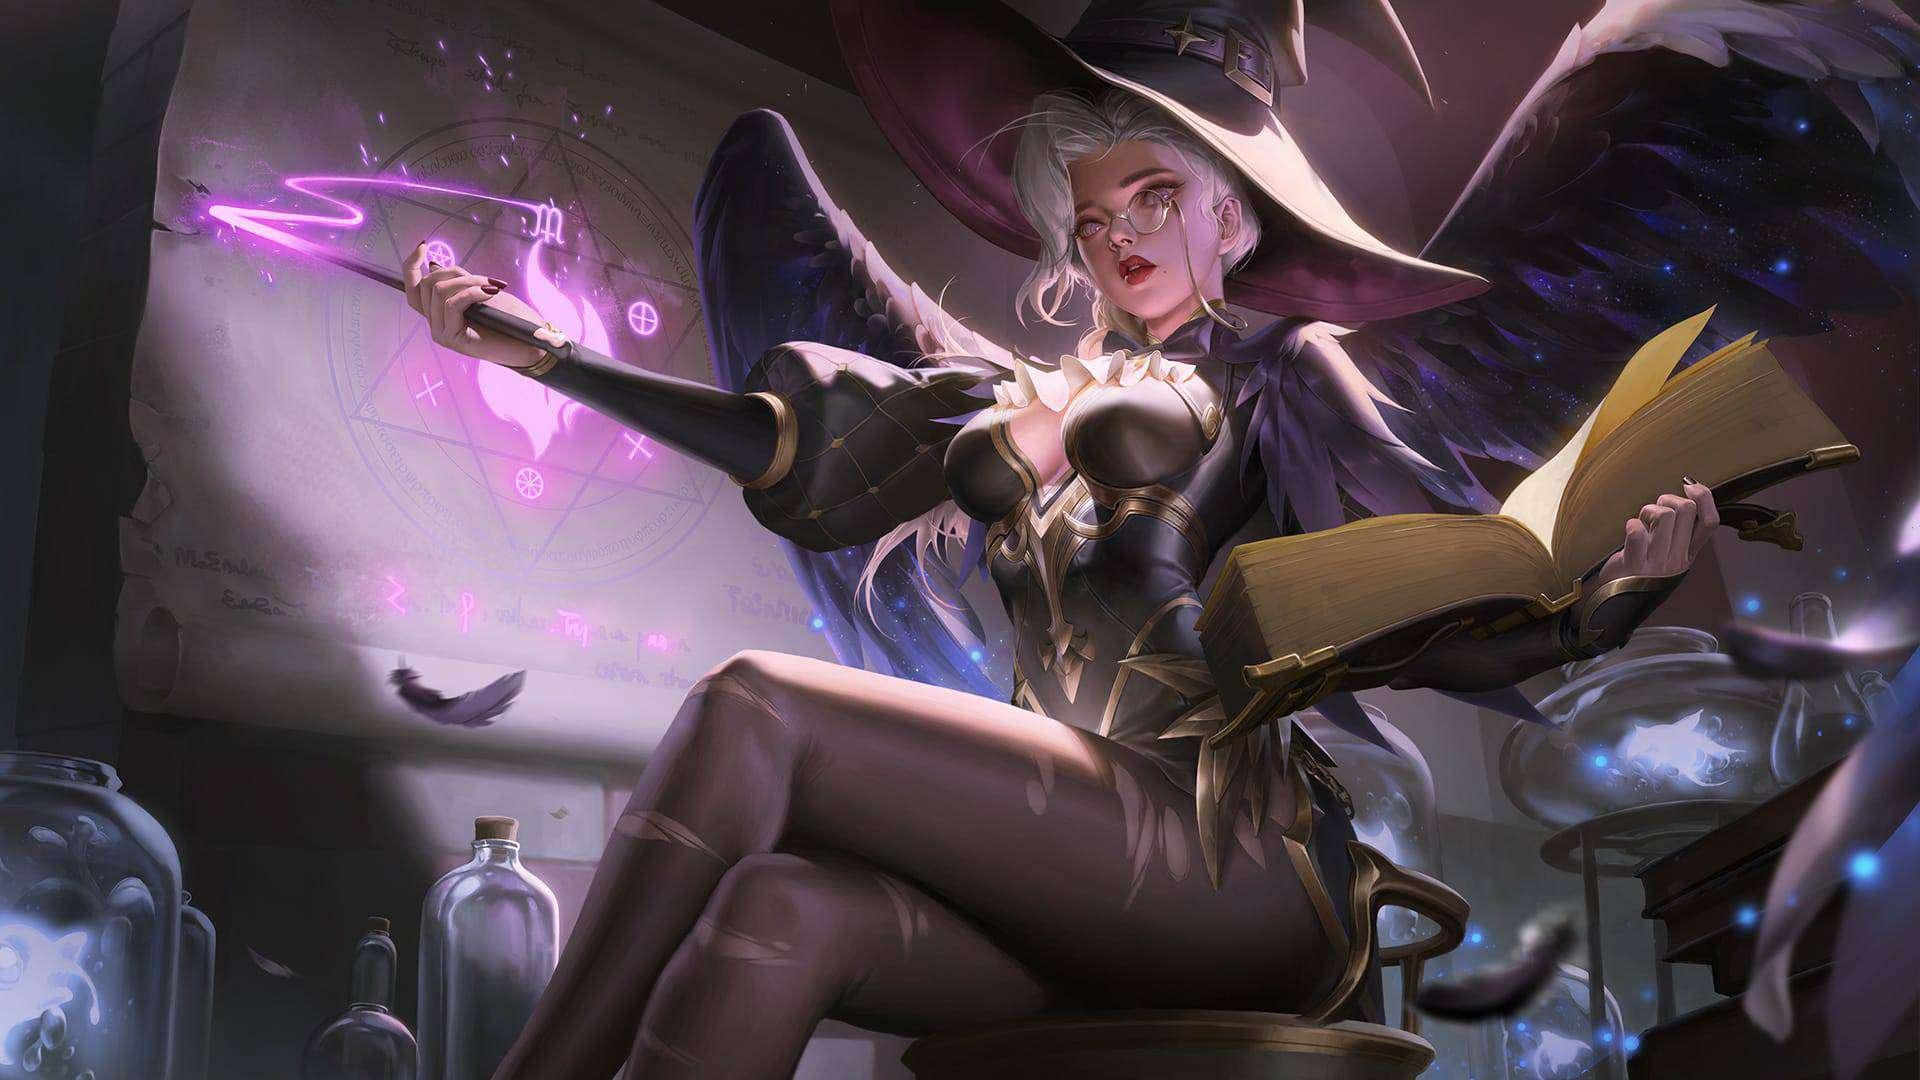 Wallpaper Alice MLBB Skin Wizardy Teacher HD for PC Hobigame